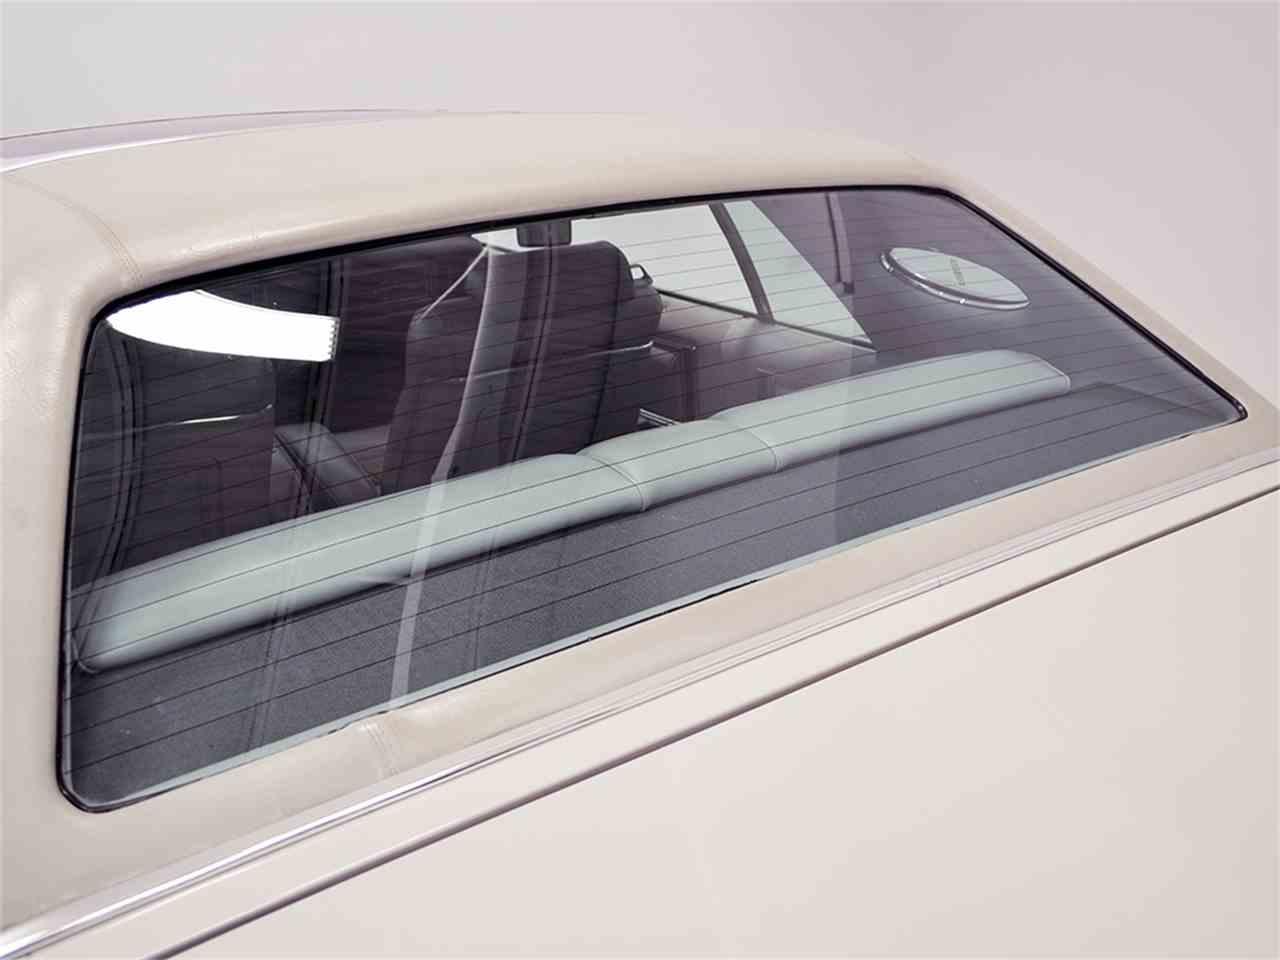 Large Picture of '77 Continental Mark V - $13,900.00 Offered by Harwood Motors, LTD. - JOGC